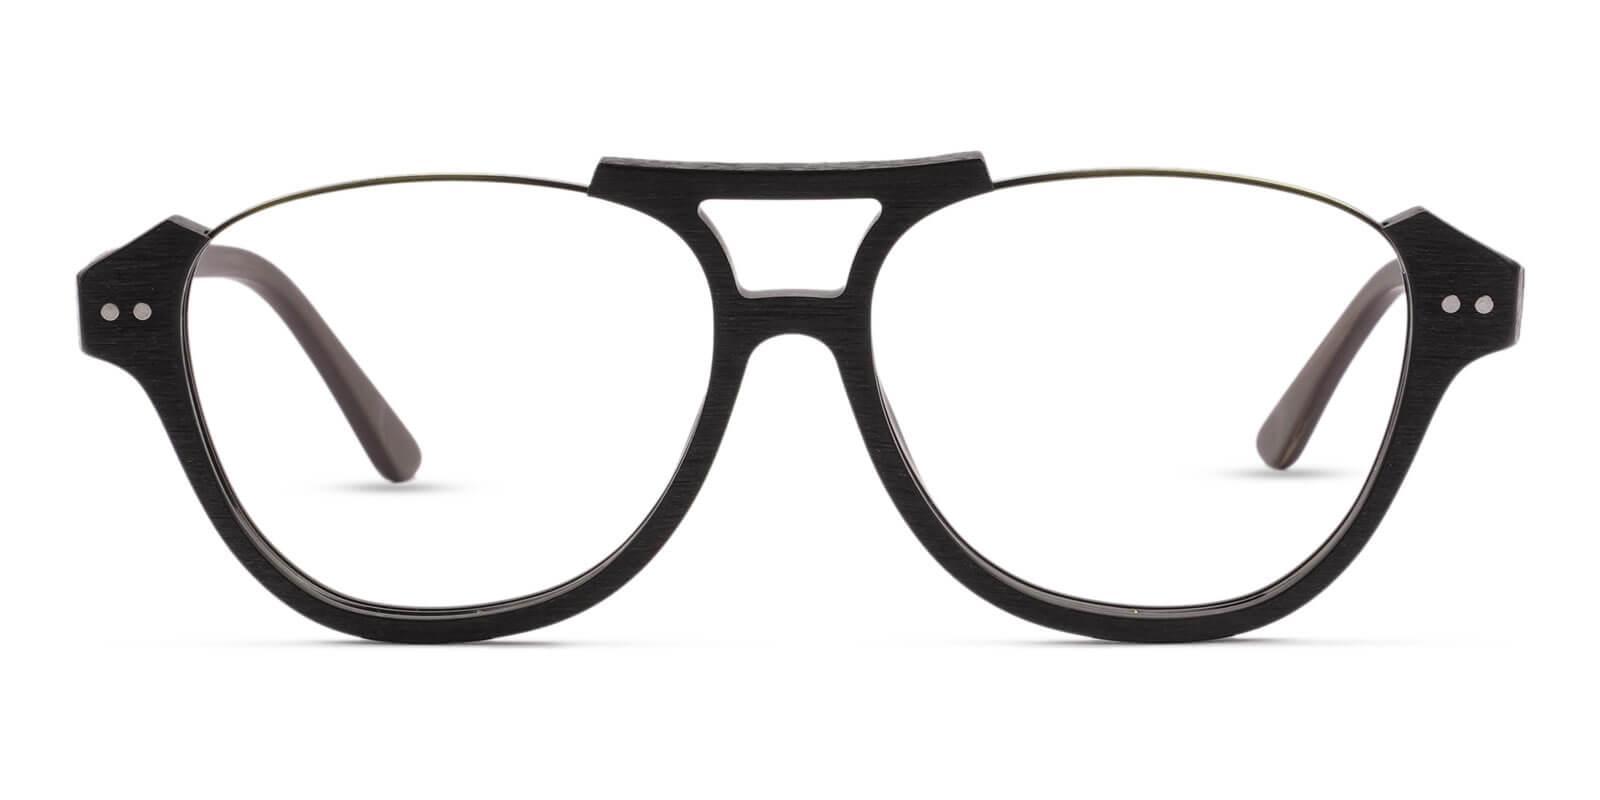 Ocean Gate Brown Combination Eyeglasses , UniversalBridgeFit Frames from ABBE Glasses